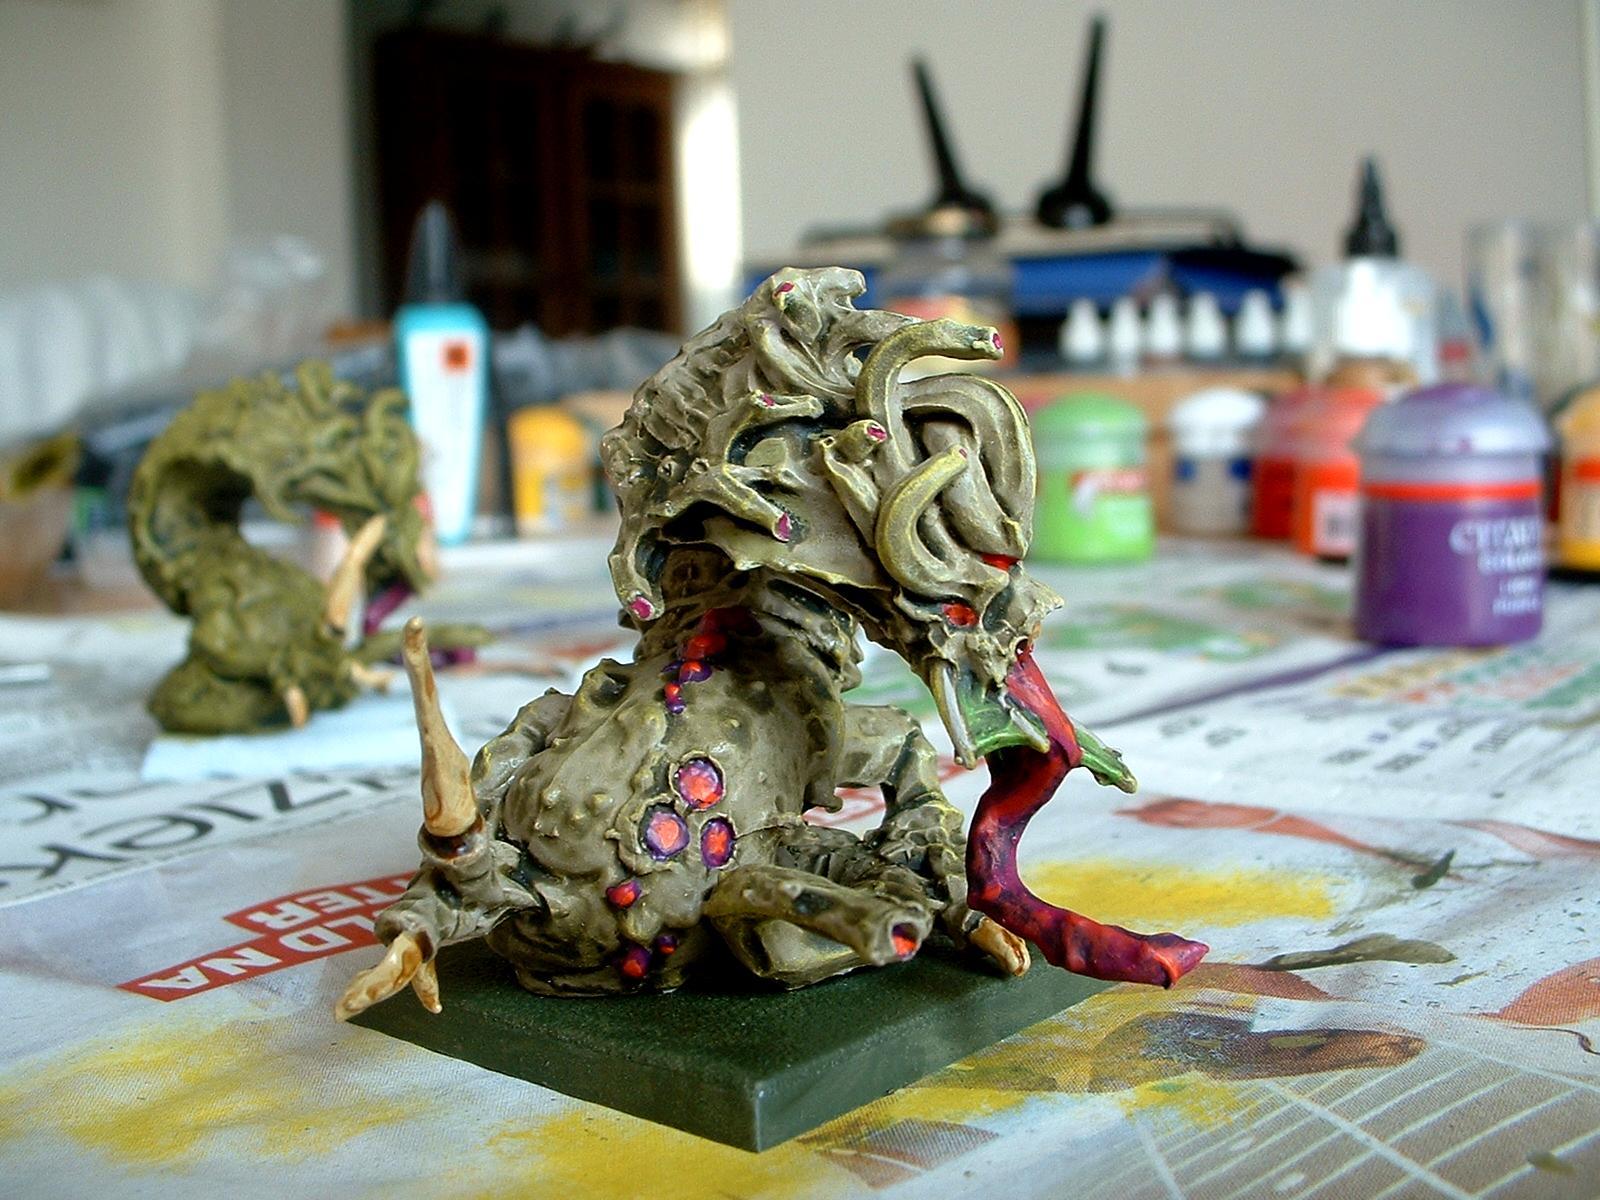 Beasts Of Nurgle, Chaos, Daemons, Nurgle, Work In Progress